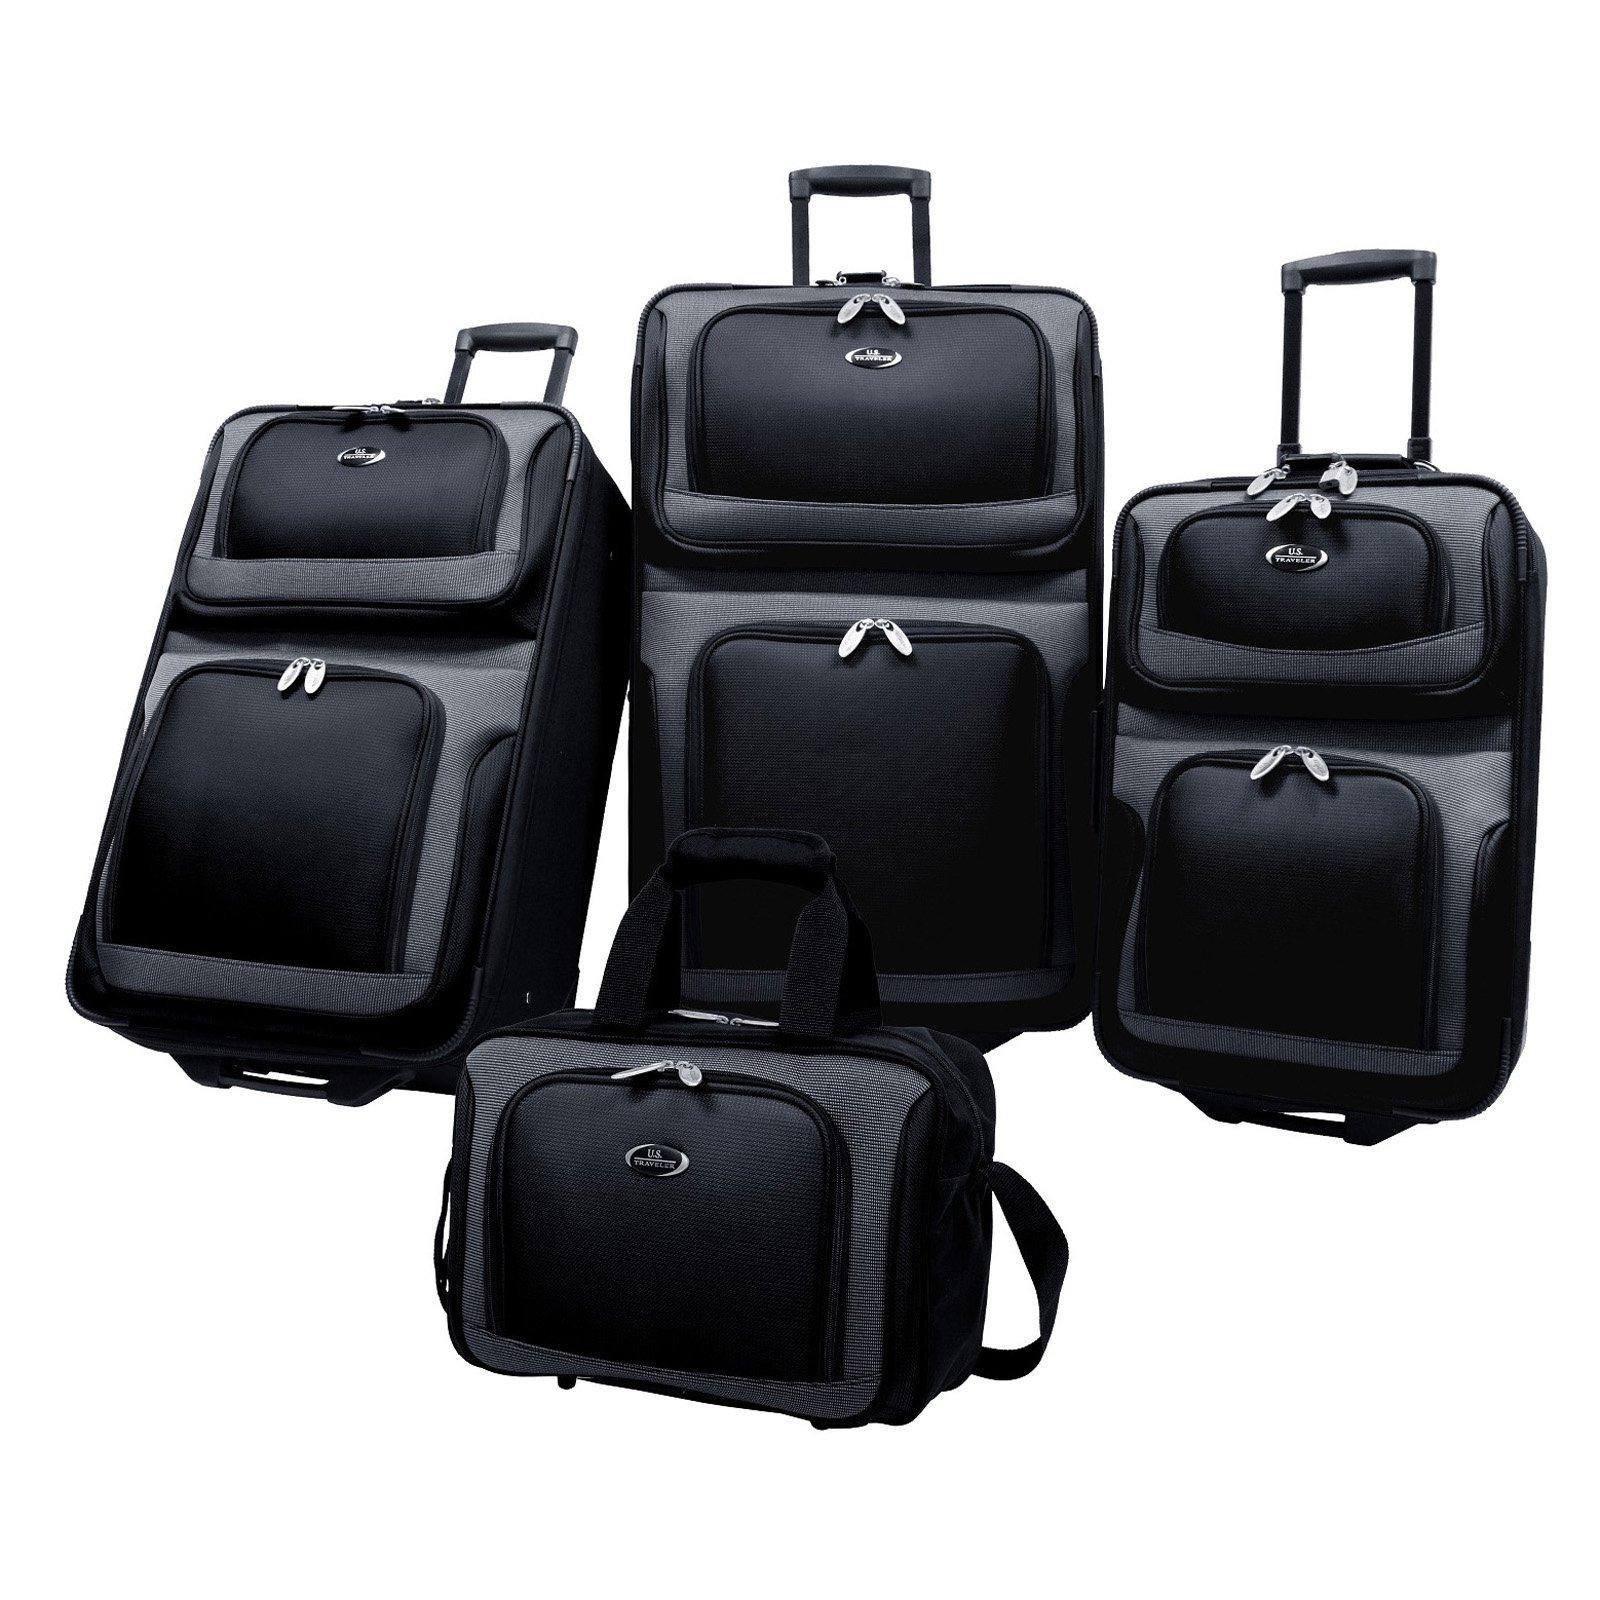 U.S. Traveler New Yorker 4-Piece Luggage Set - Walmart.com